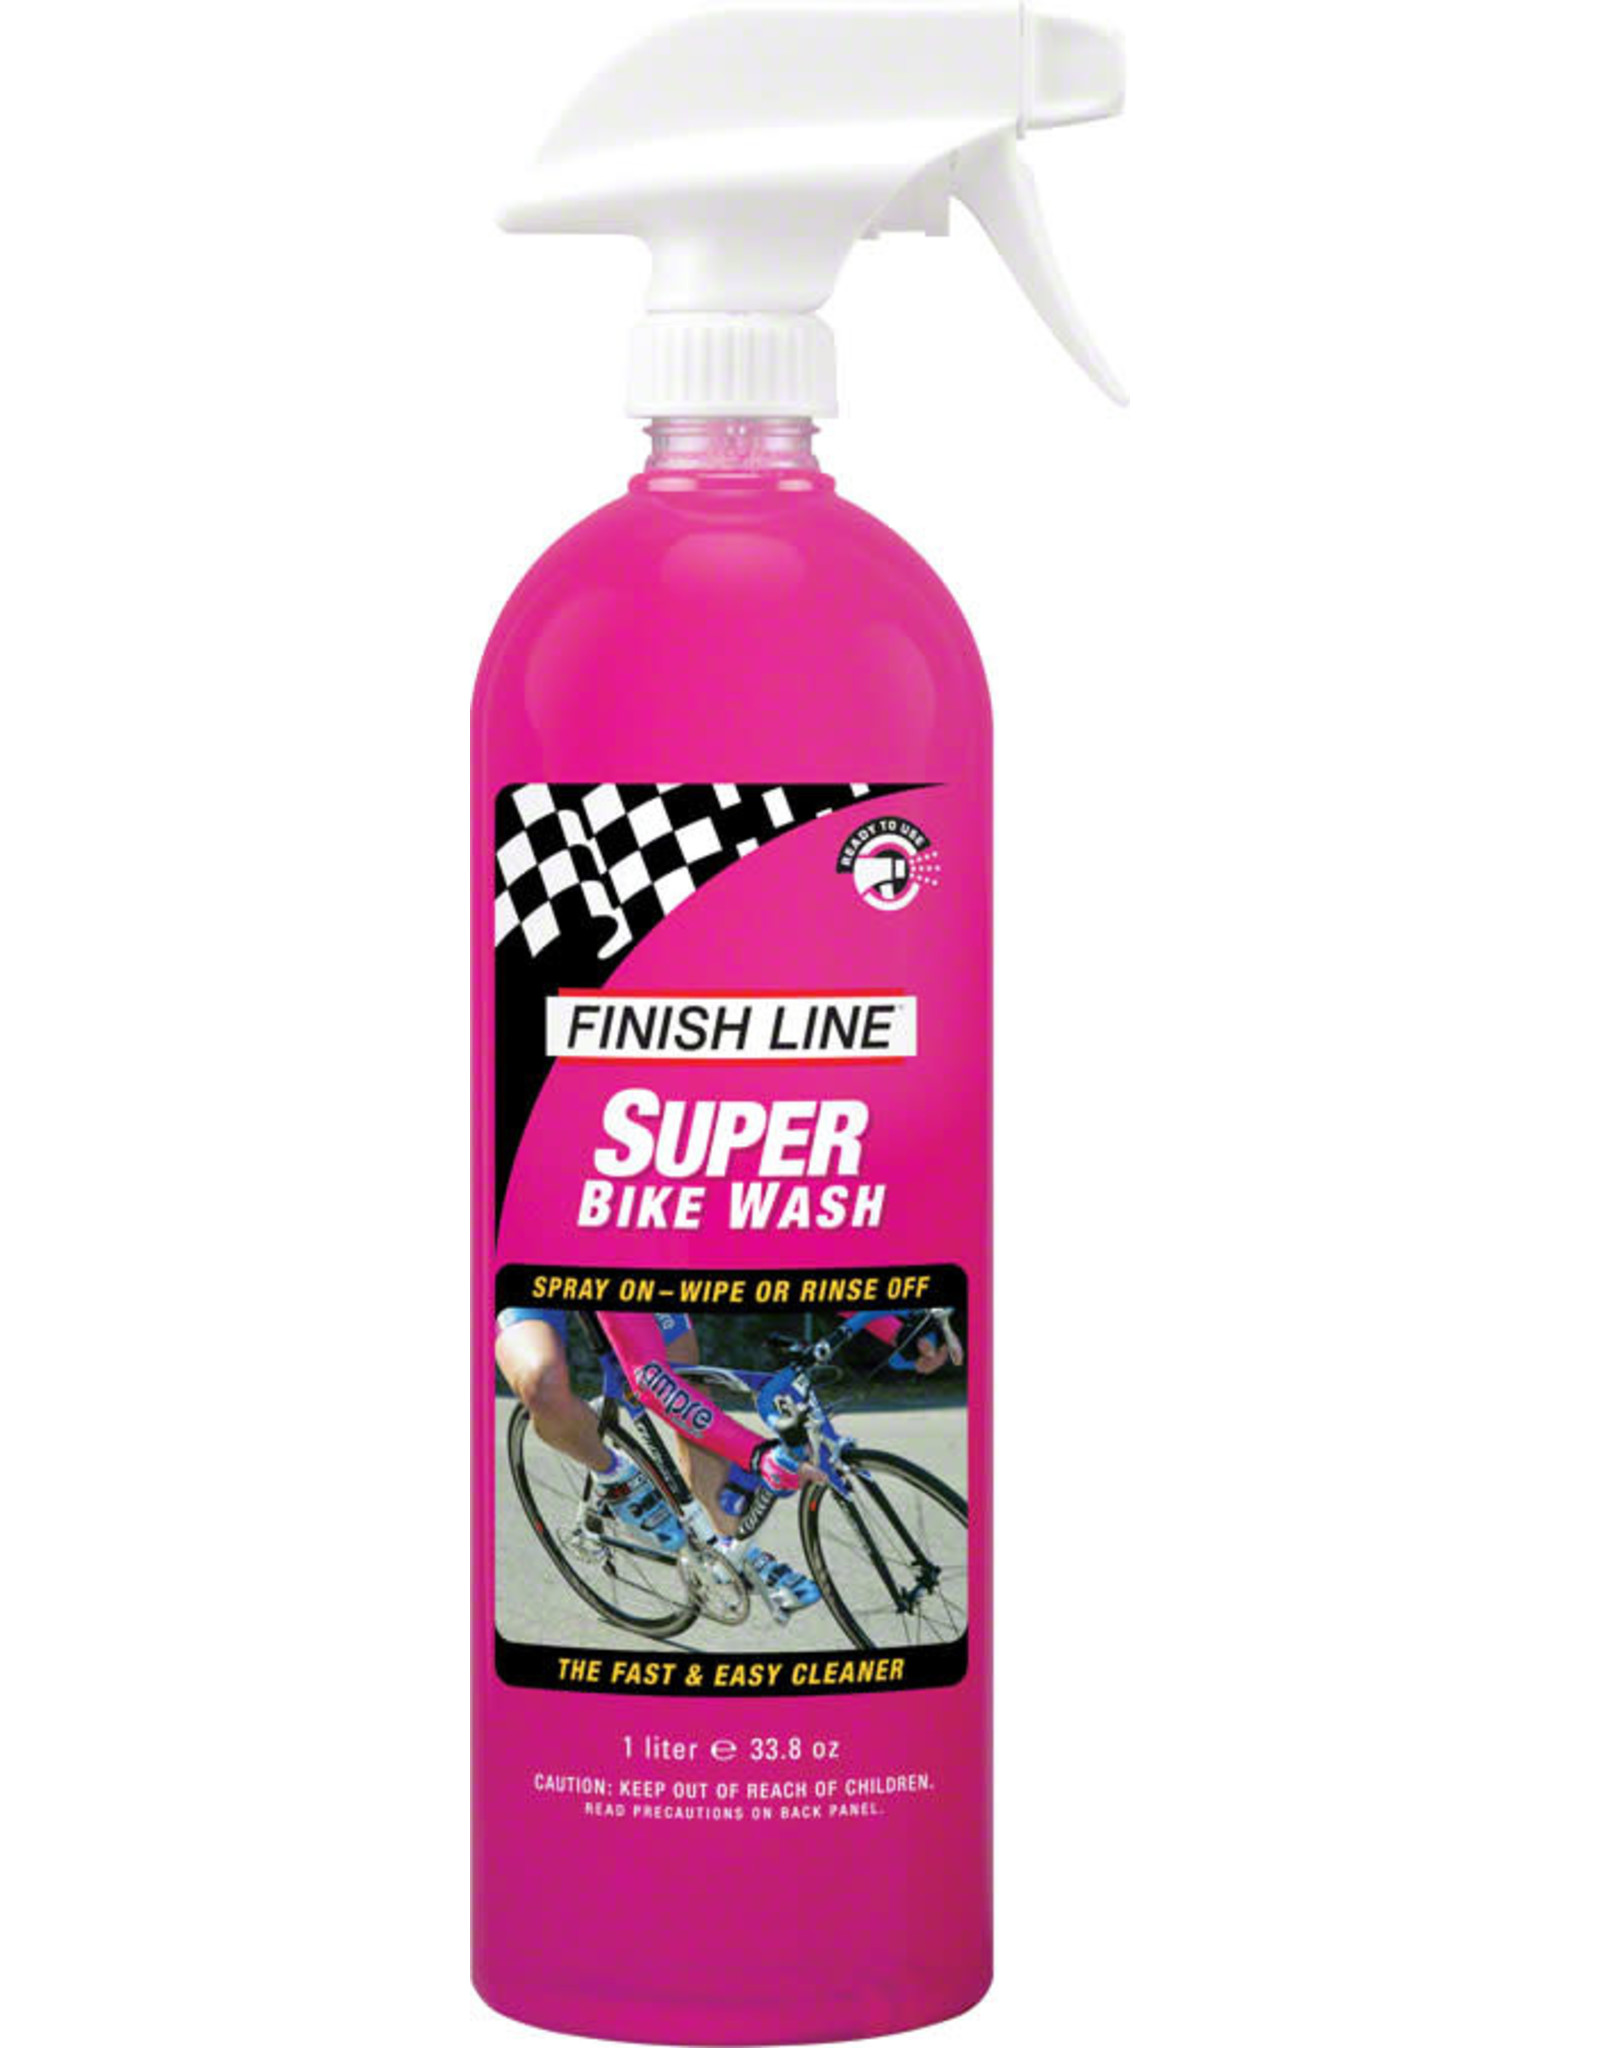 Finish Line Finish Line Super Bike Wash: 34 oz. Hand Spray Bottle